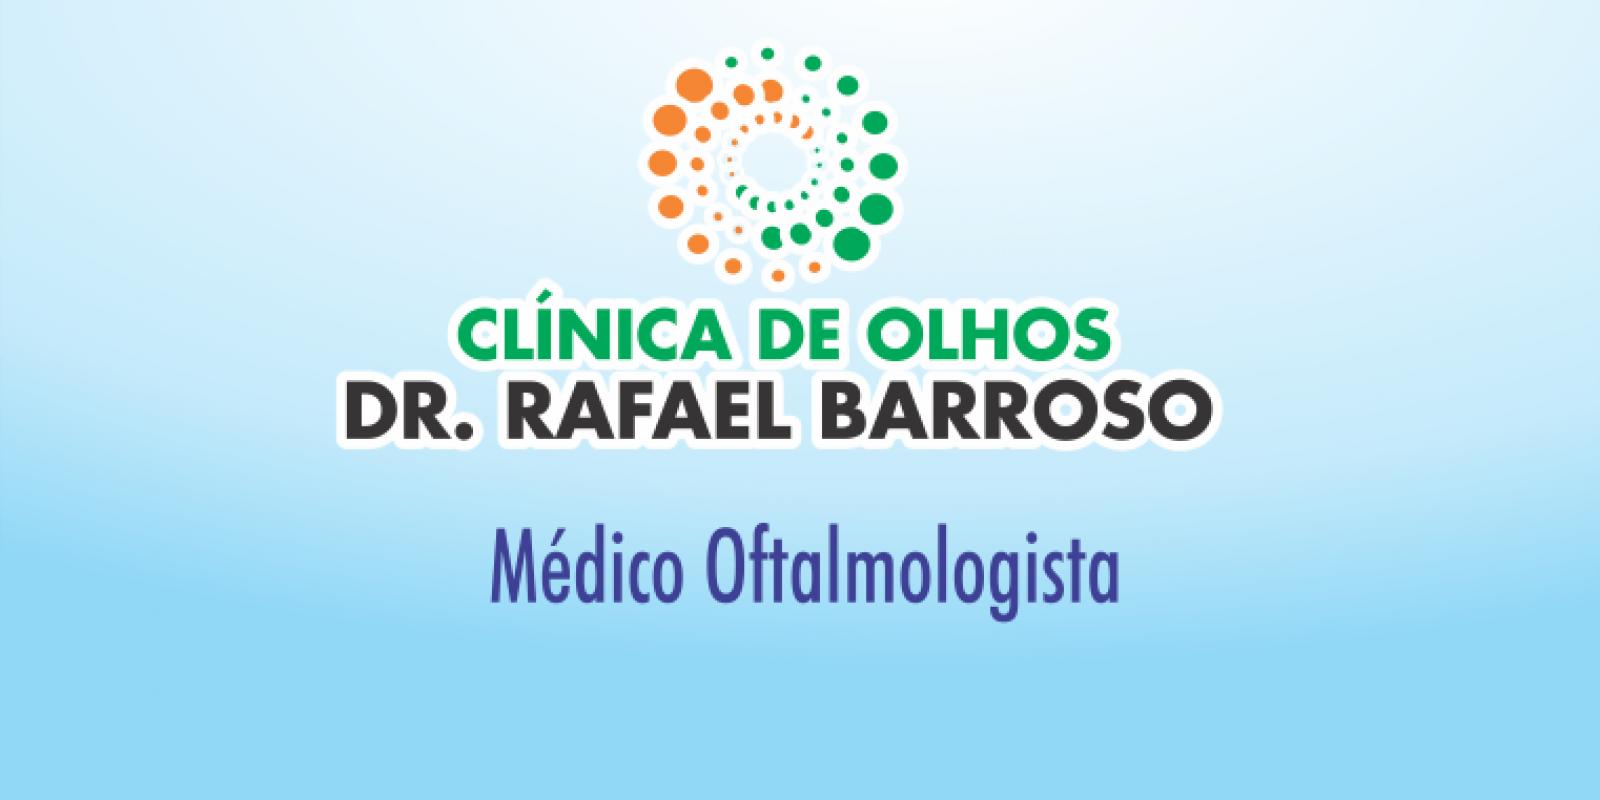 Rafael Barroso